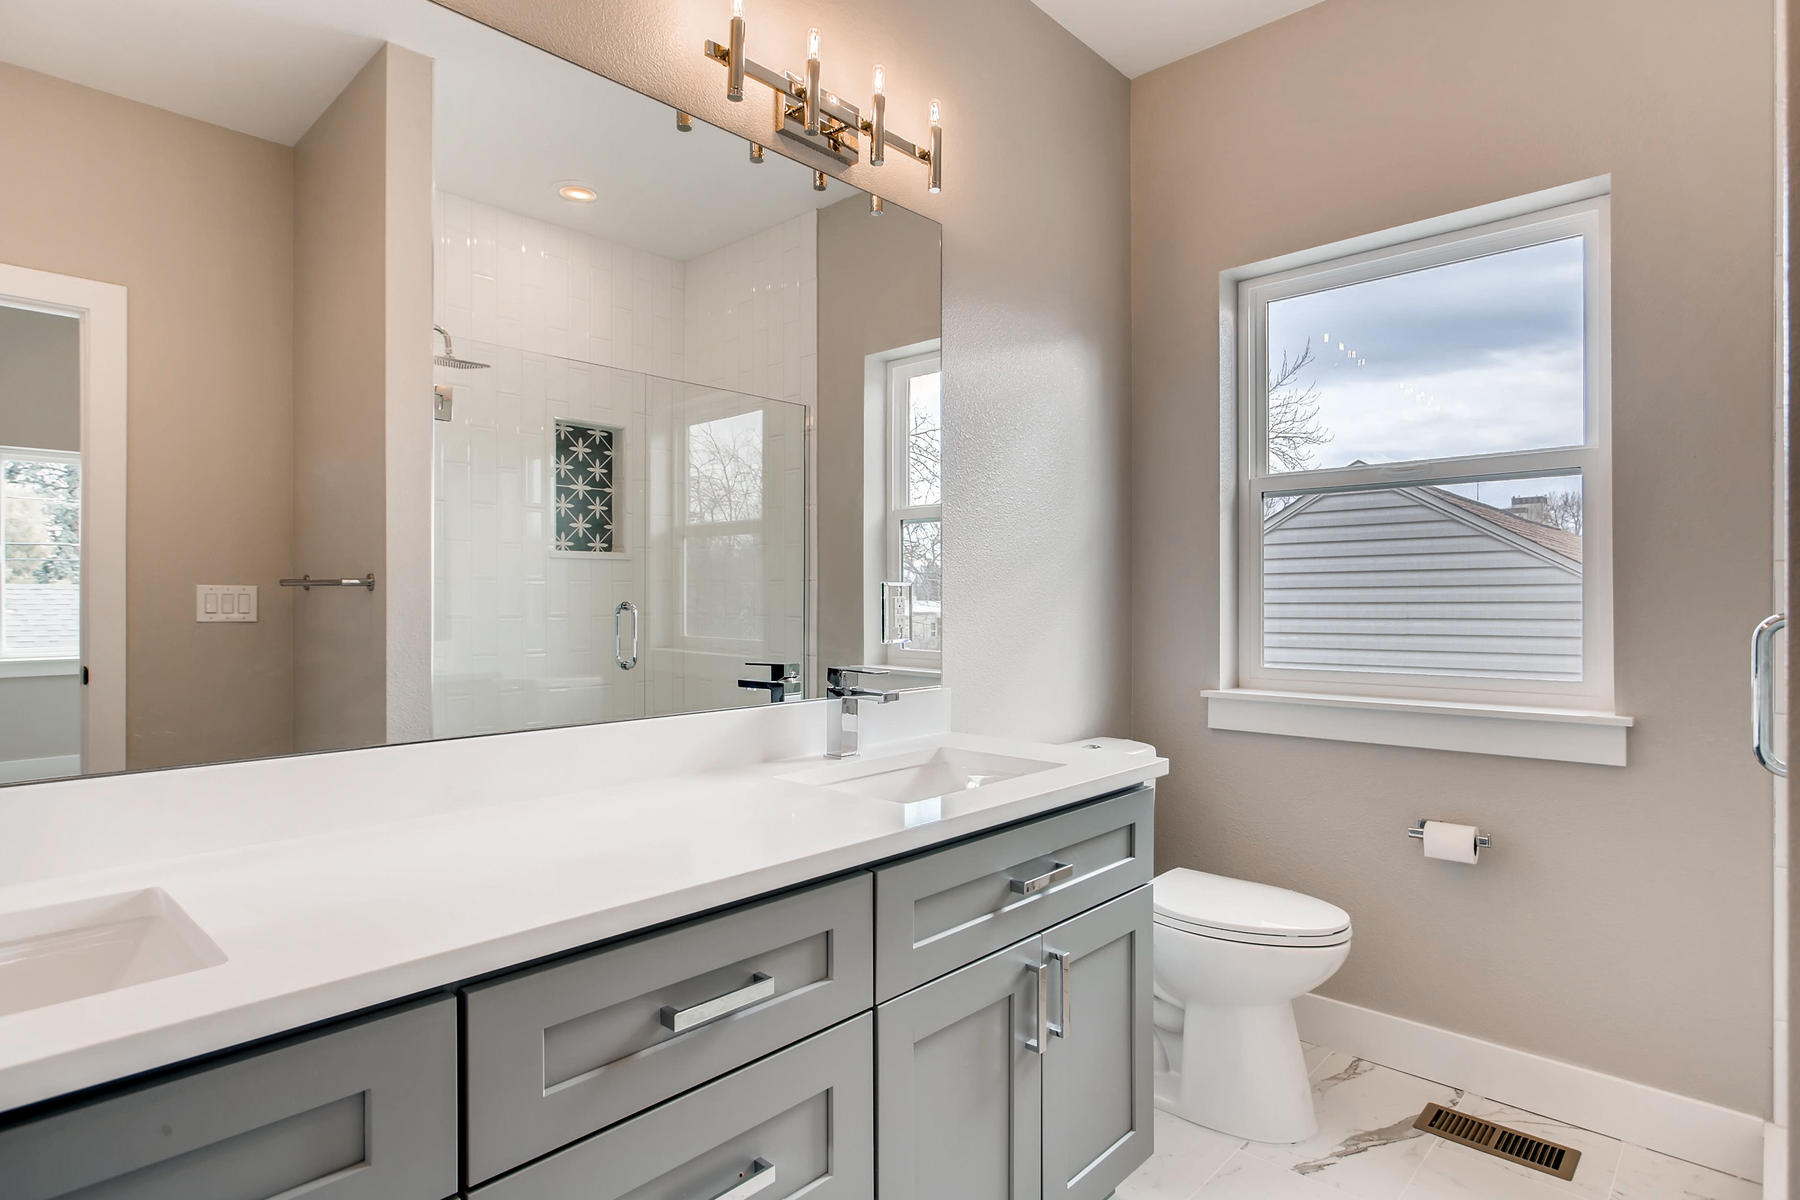 3101 S Cherokee St Englewood-013-15-2nd Floor Master Bathroom-MLS_Size.jpg